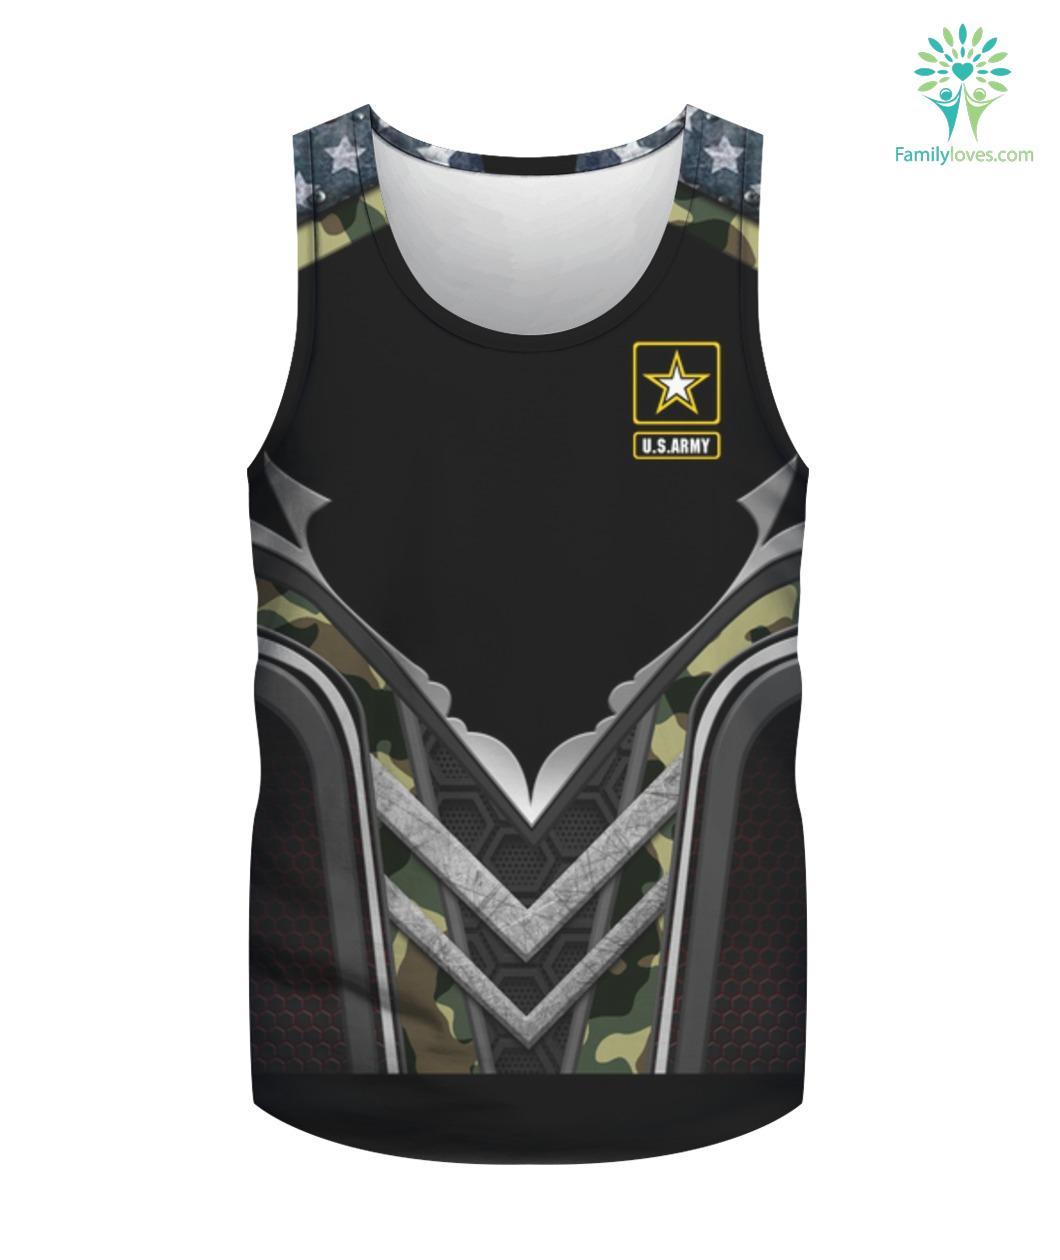 Proud Army Stepdad Shirt - Military Family Shirts Gift Familyloves.com